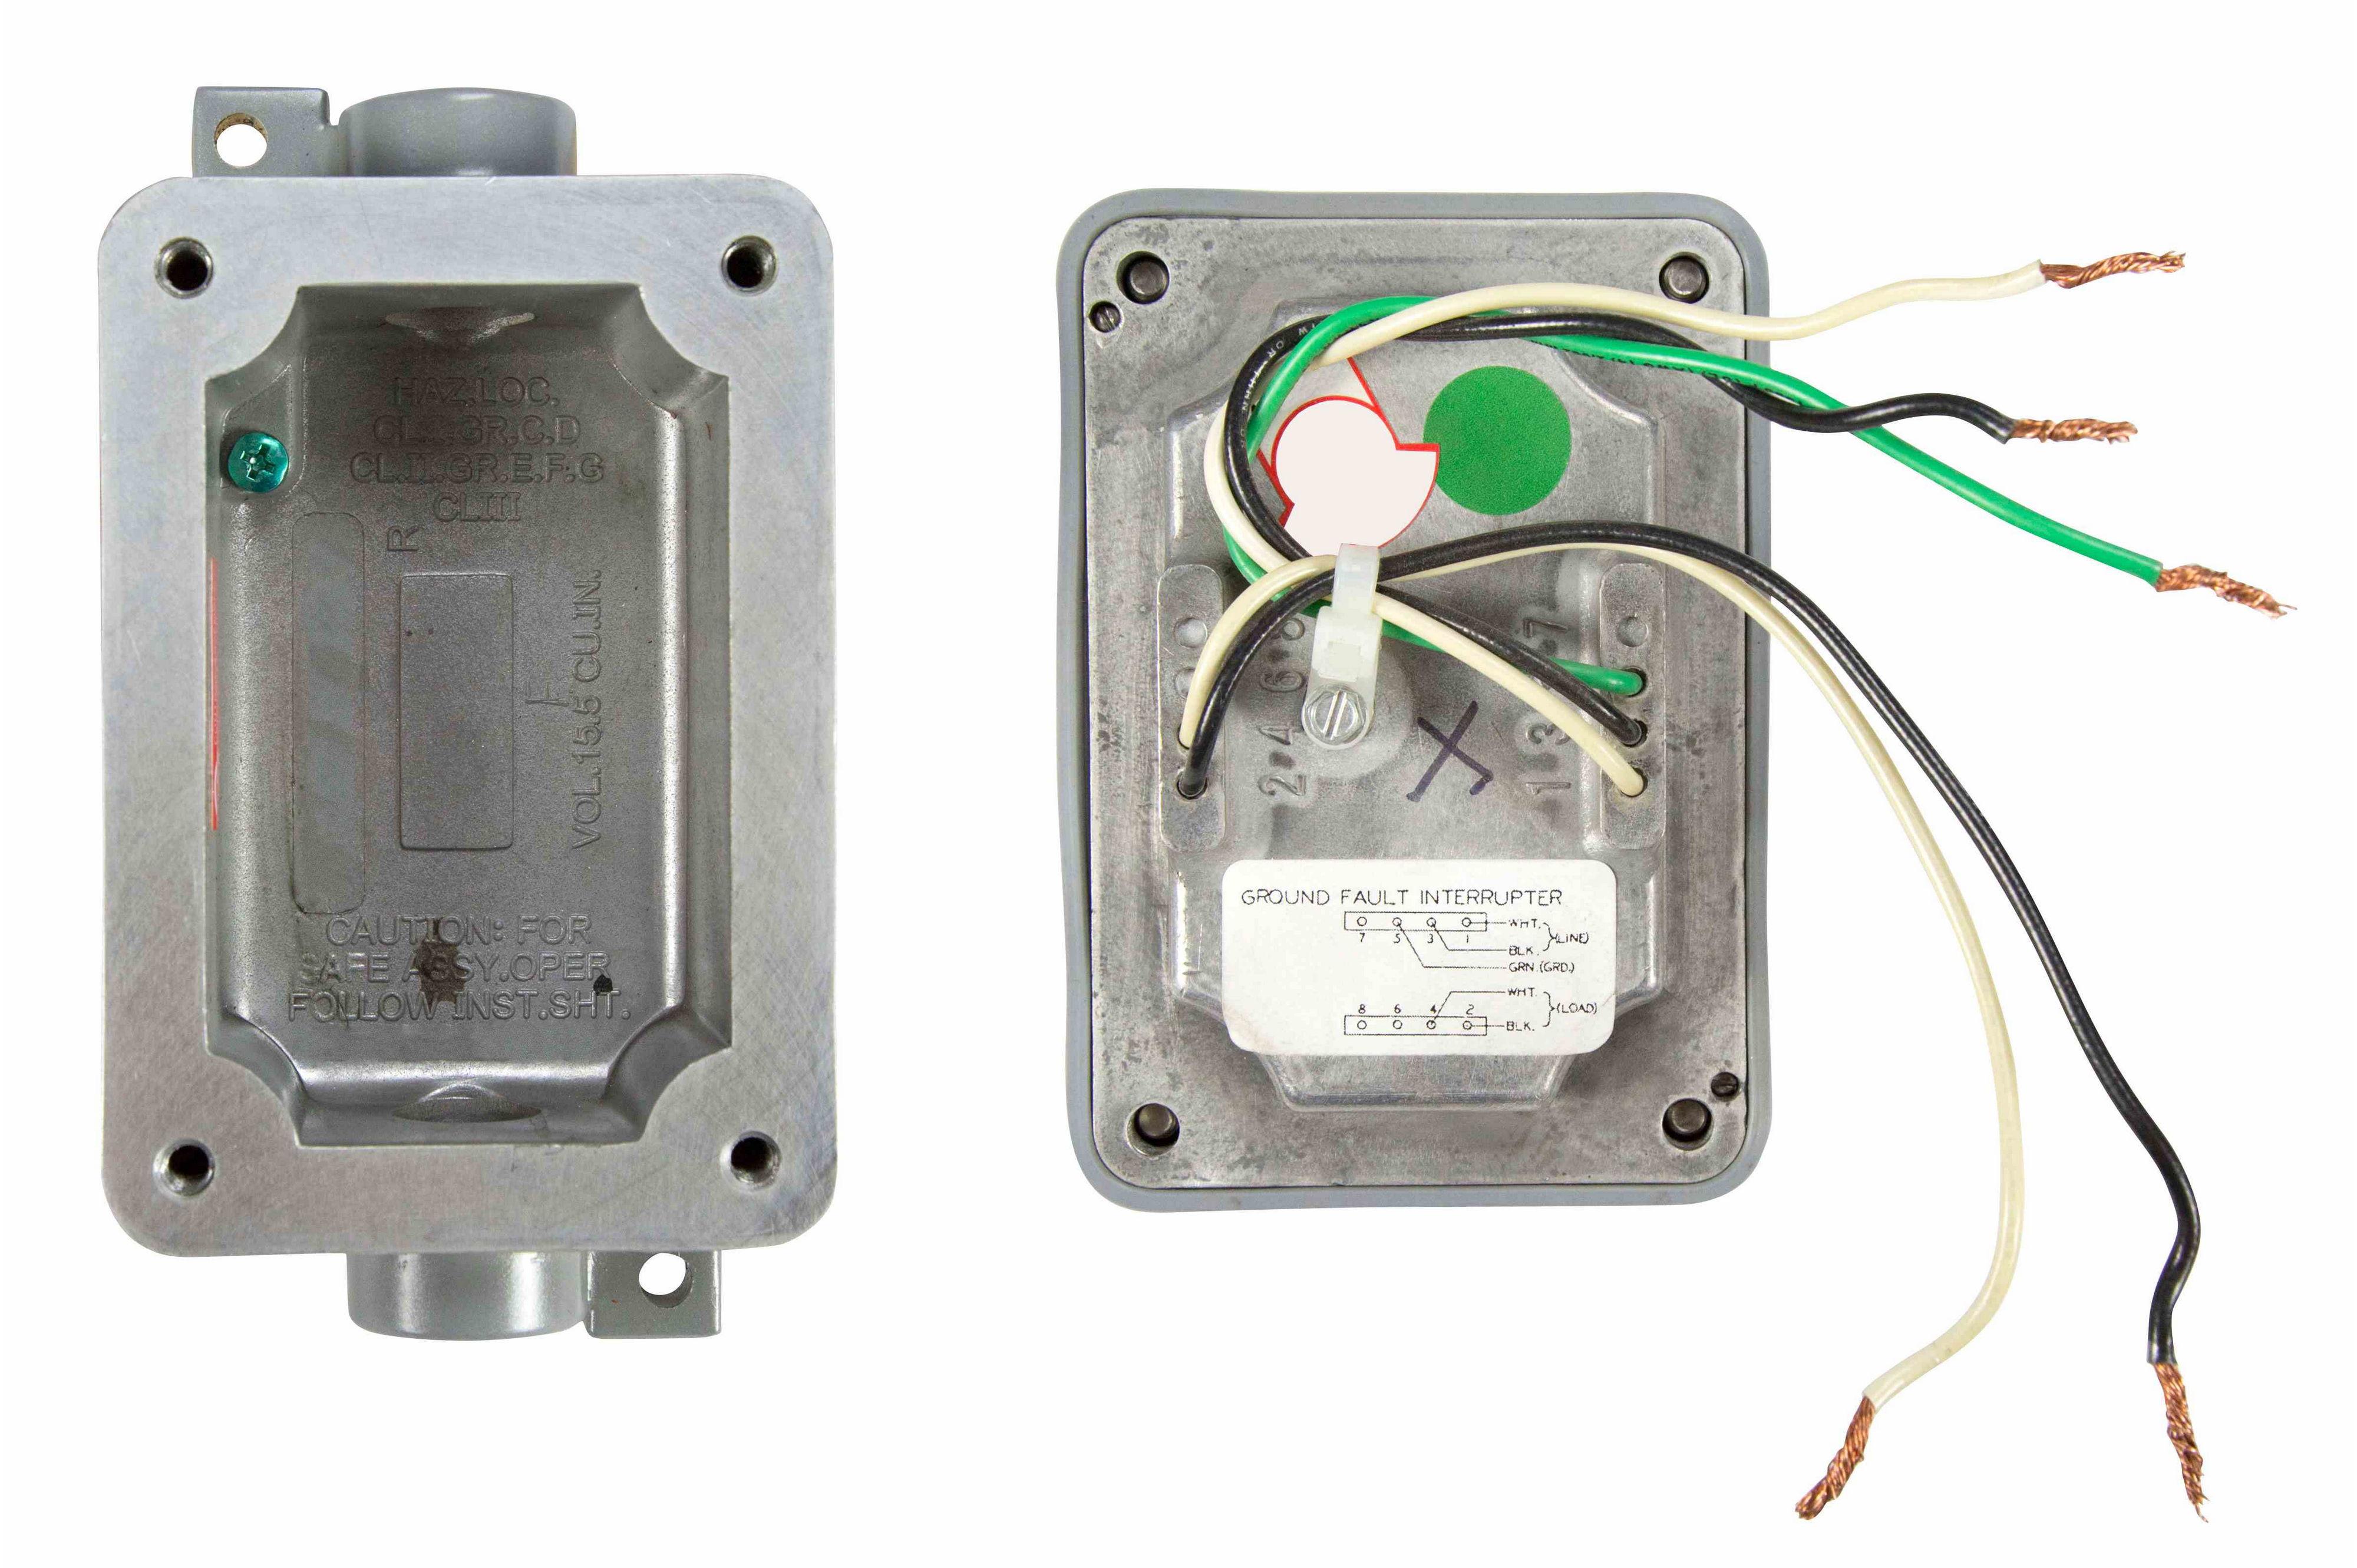 Explosion Proof 20 Amp Ground Fault Circuit Interrupter Interruptor Hi Res Image 3